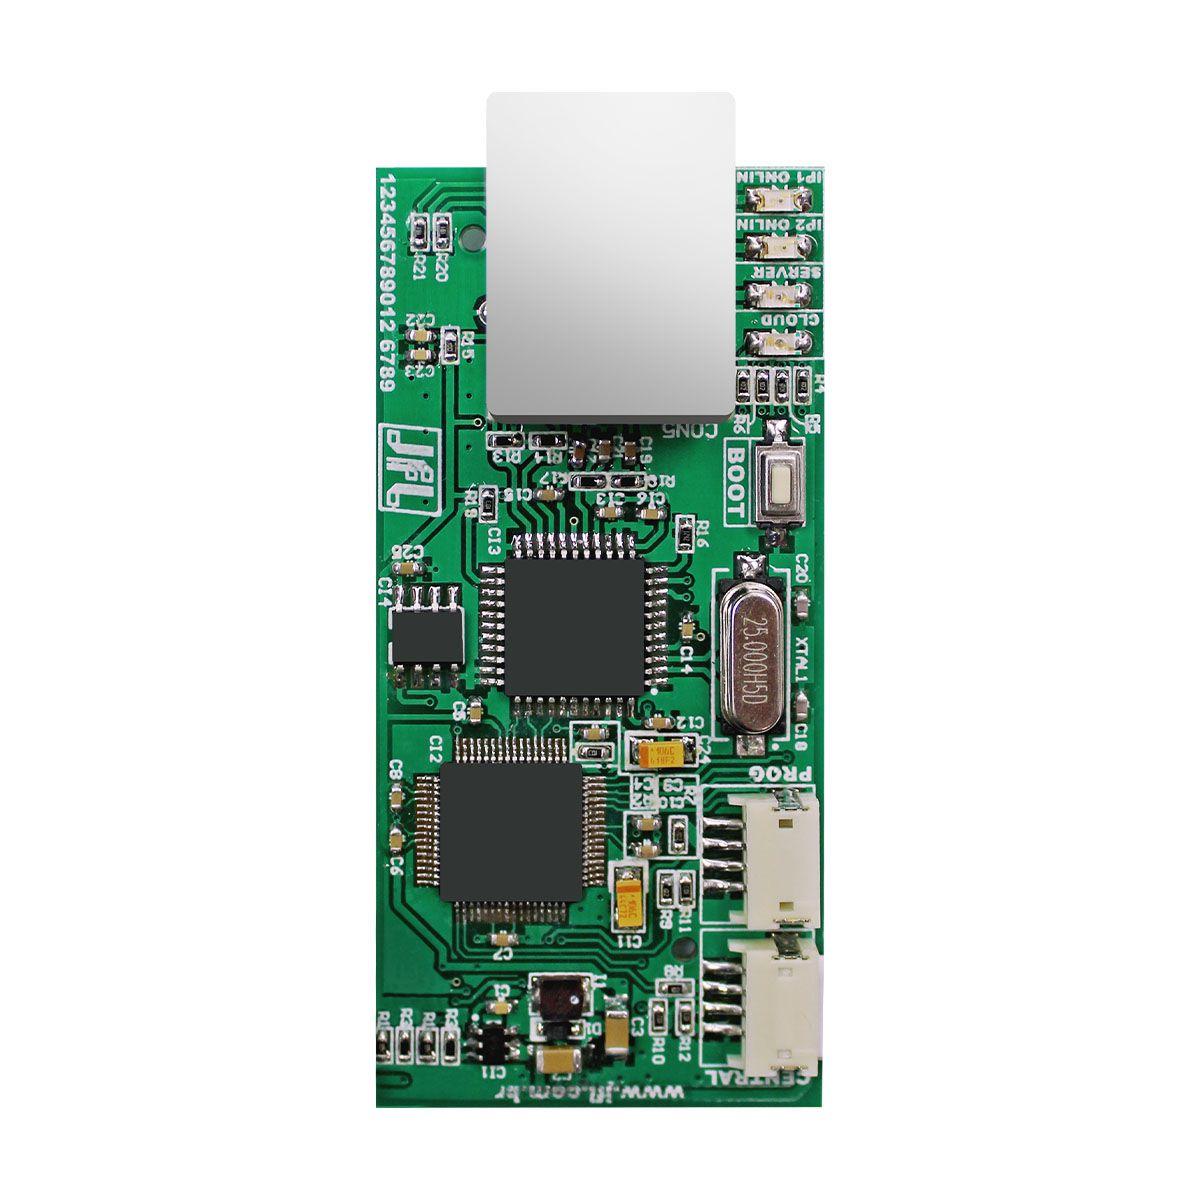 Central De Alarme Jfl Smartcloud 18 Com Modulo Ethernet E Bateria